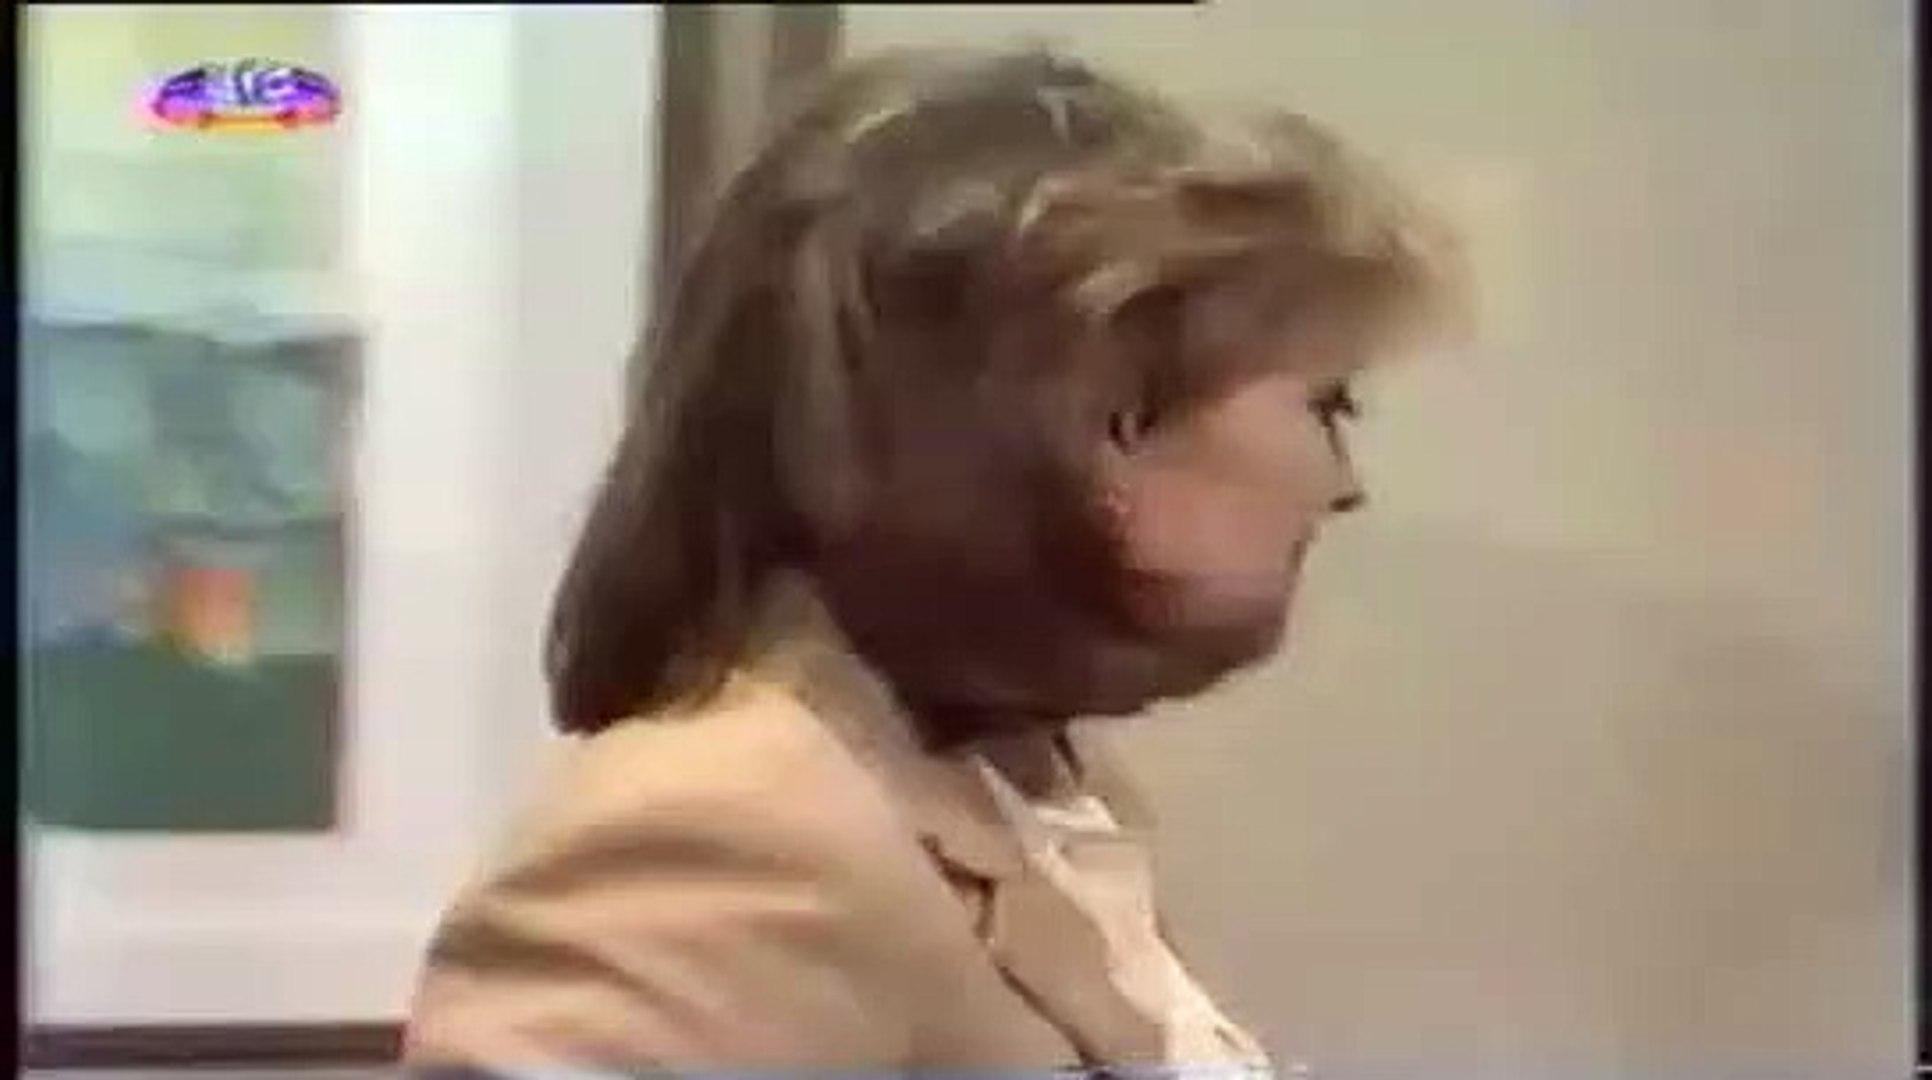 Novela Guerra dos Sexos (1983) - Barraco entre Vânia e Carolina